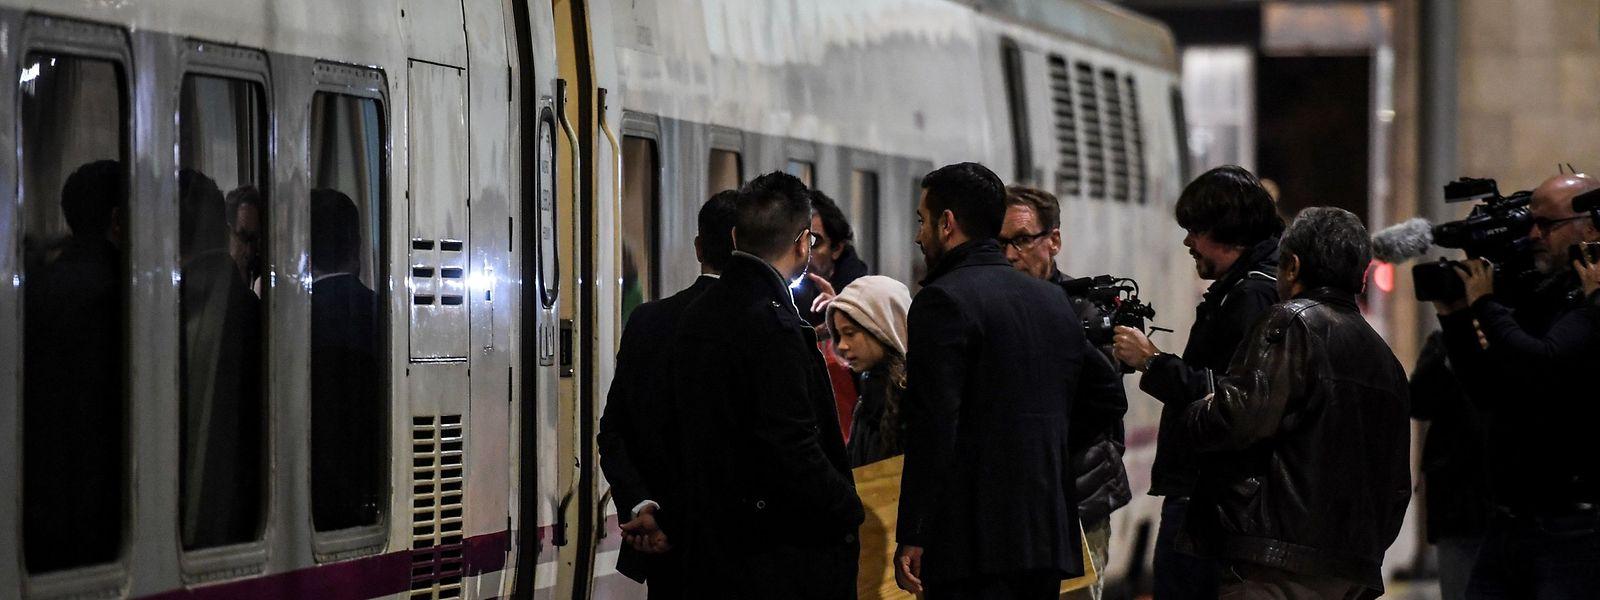 Greta Thunberg am Bahnhof in Lissabon, auf dem Weg nach Madrid.